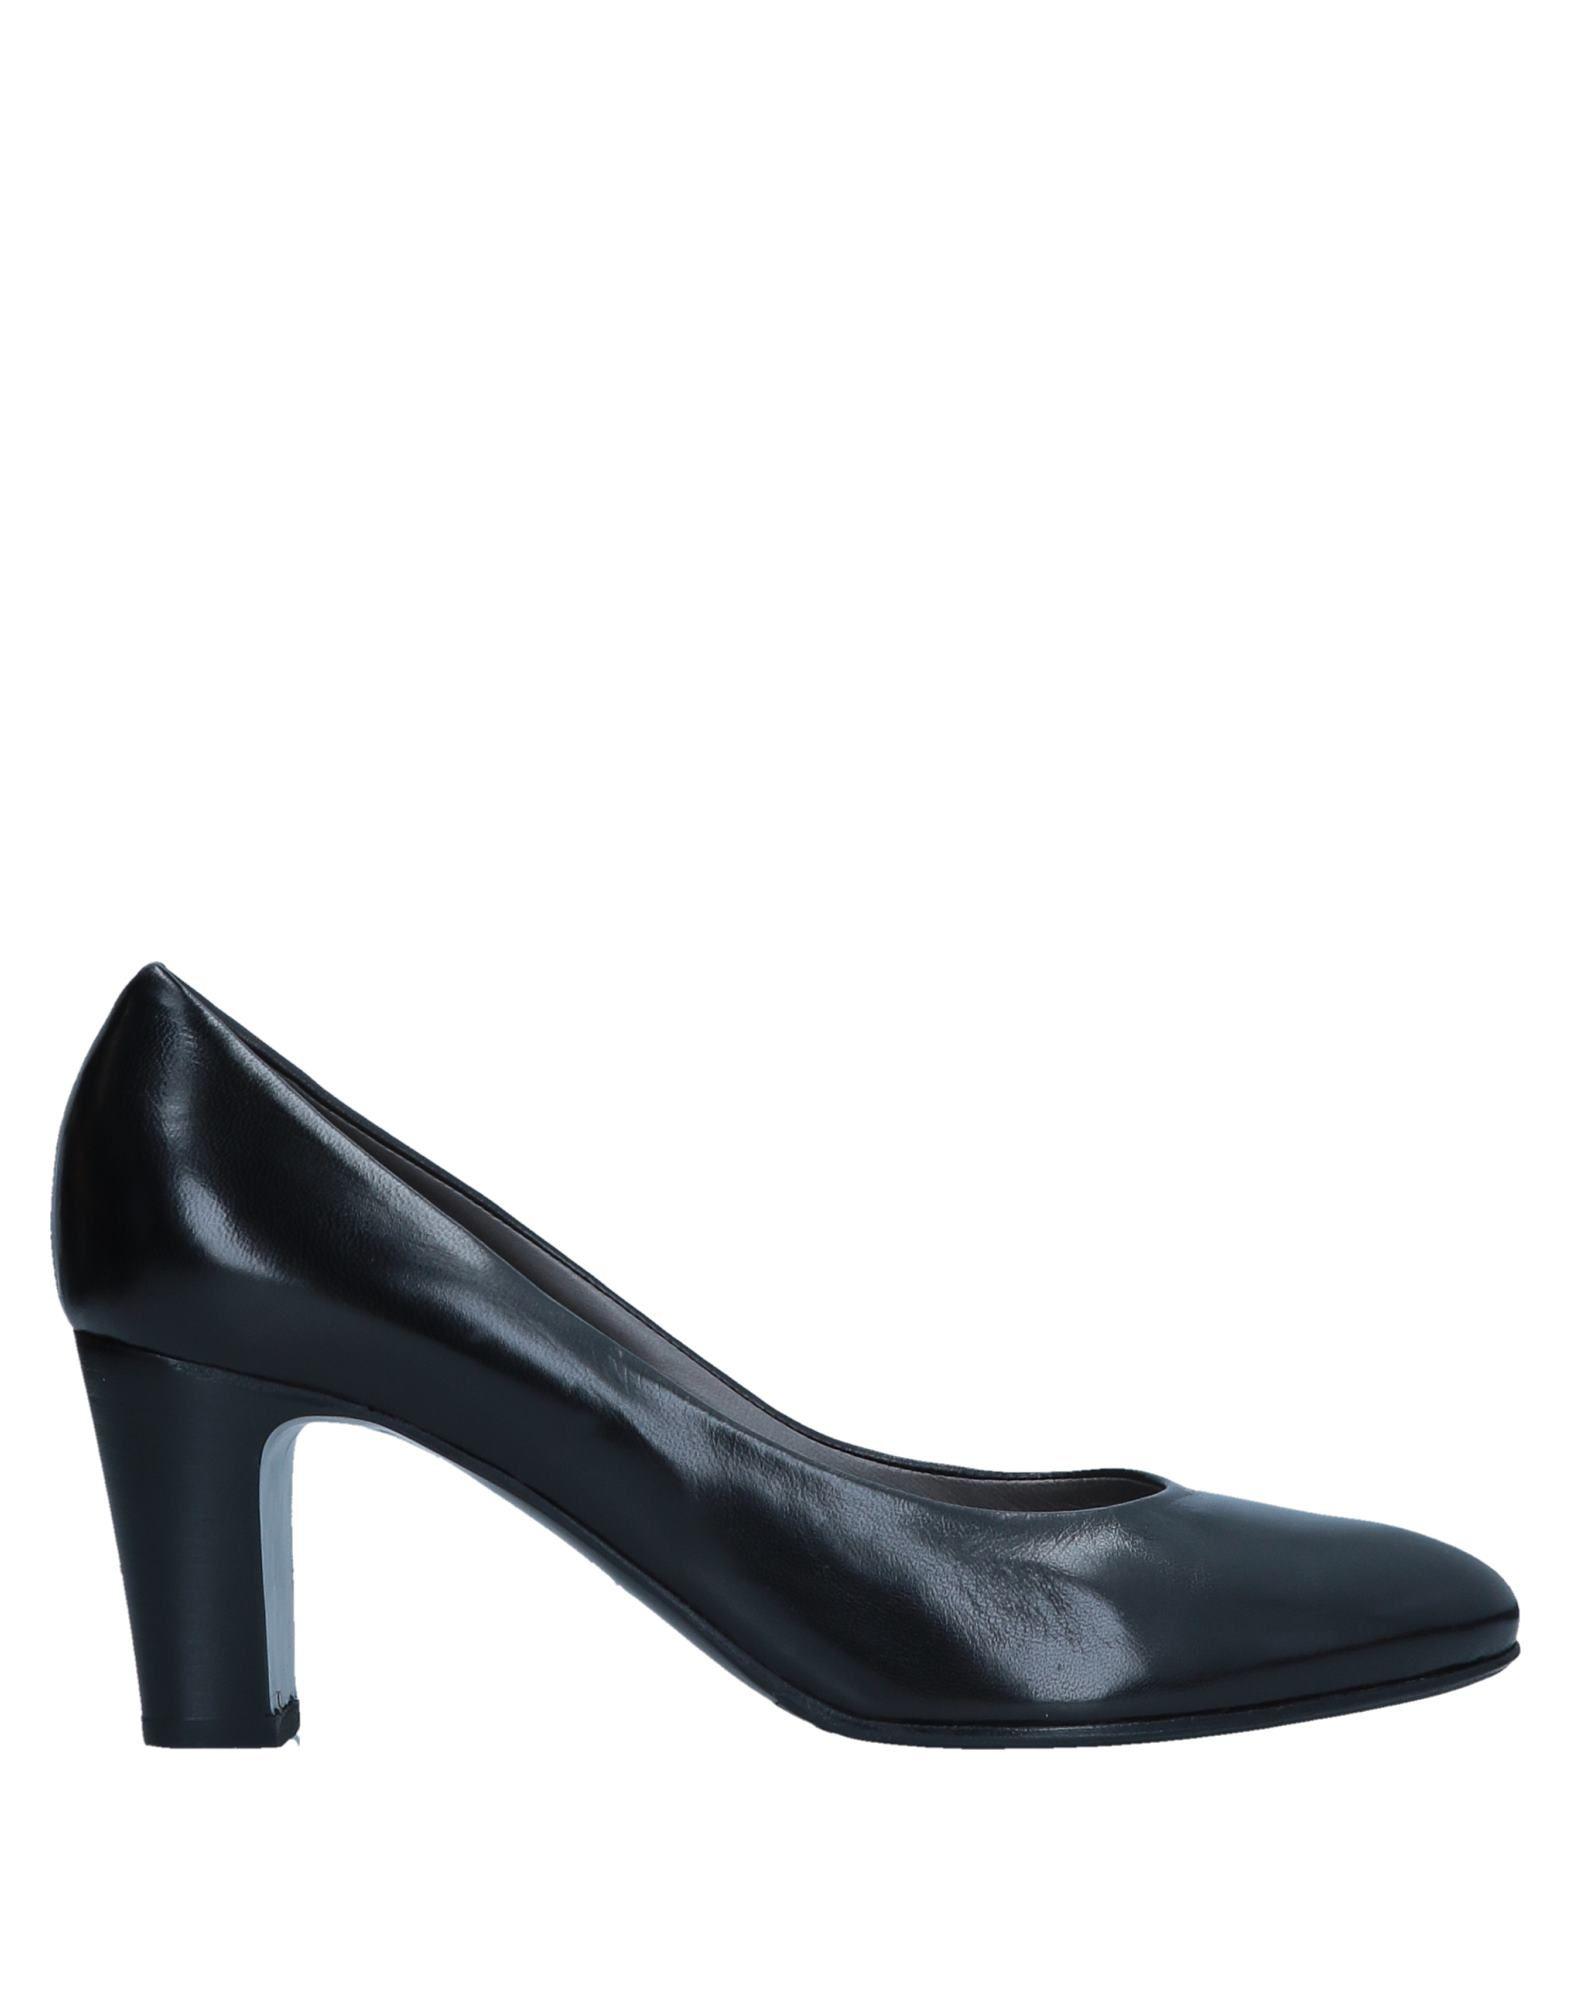 Sandali Carmens offerte Donna - 11511843NO Nuove offerte Carmens e scarpe comode 4f9262